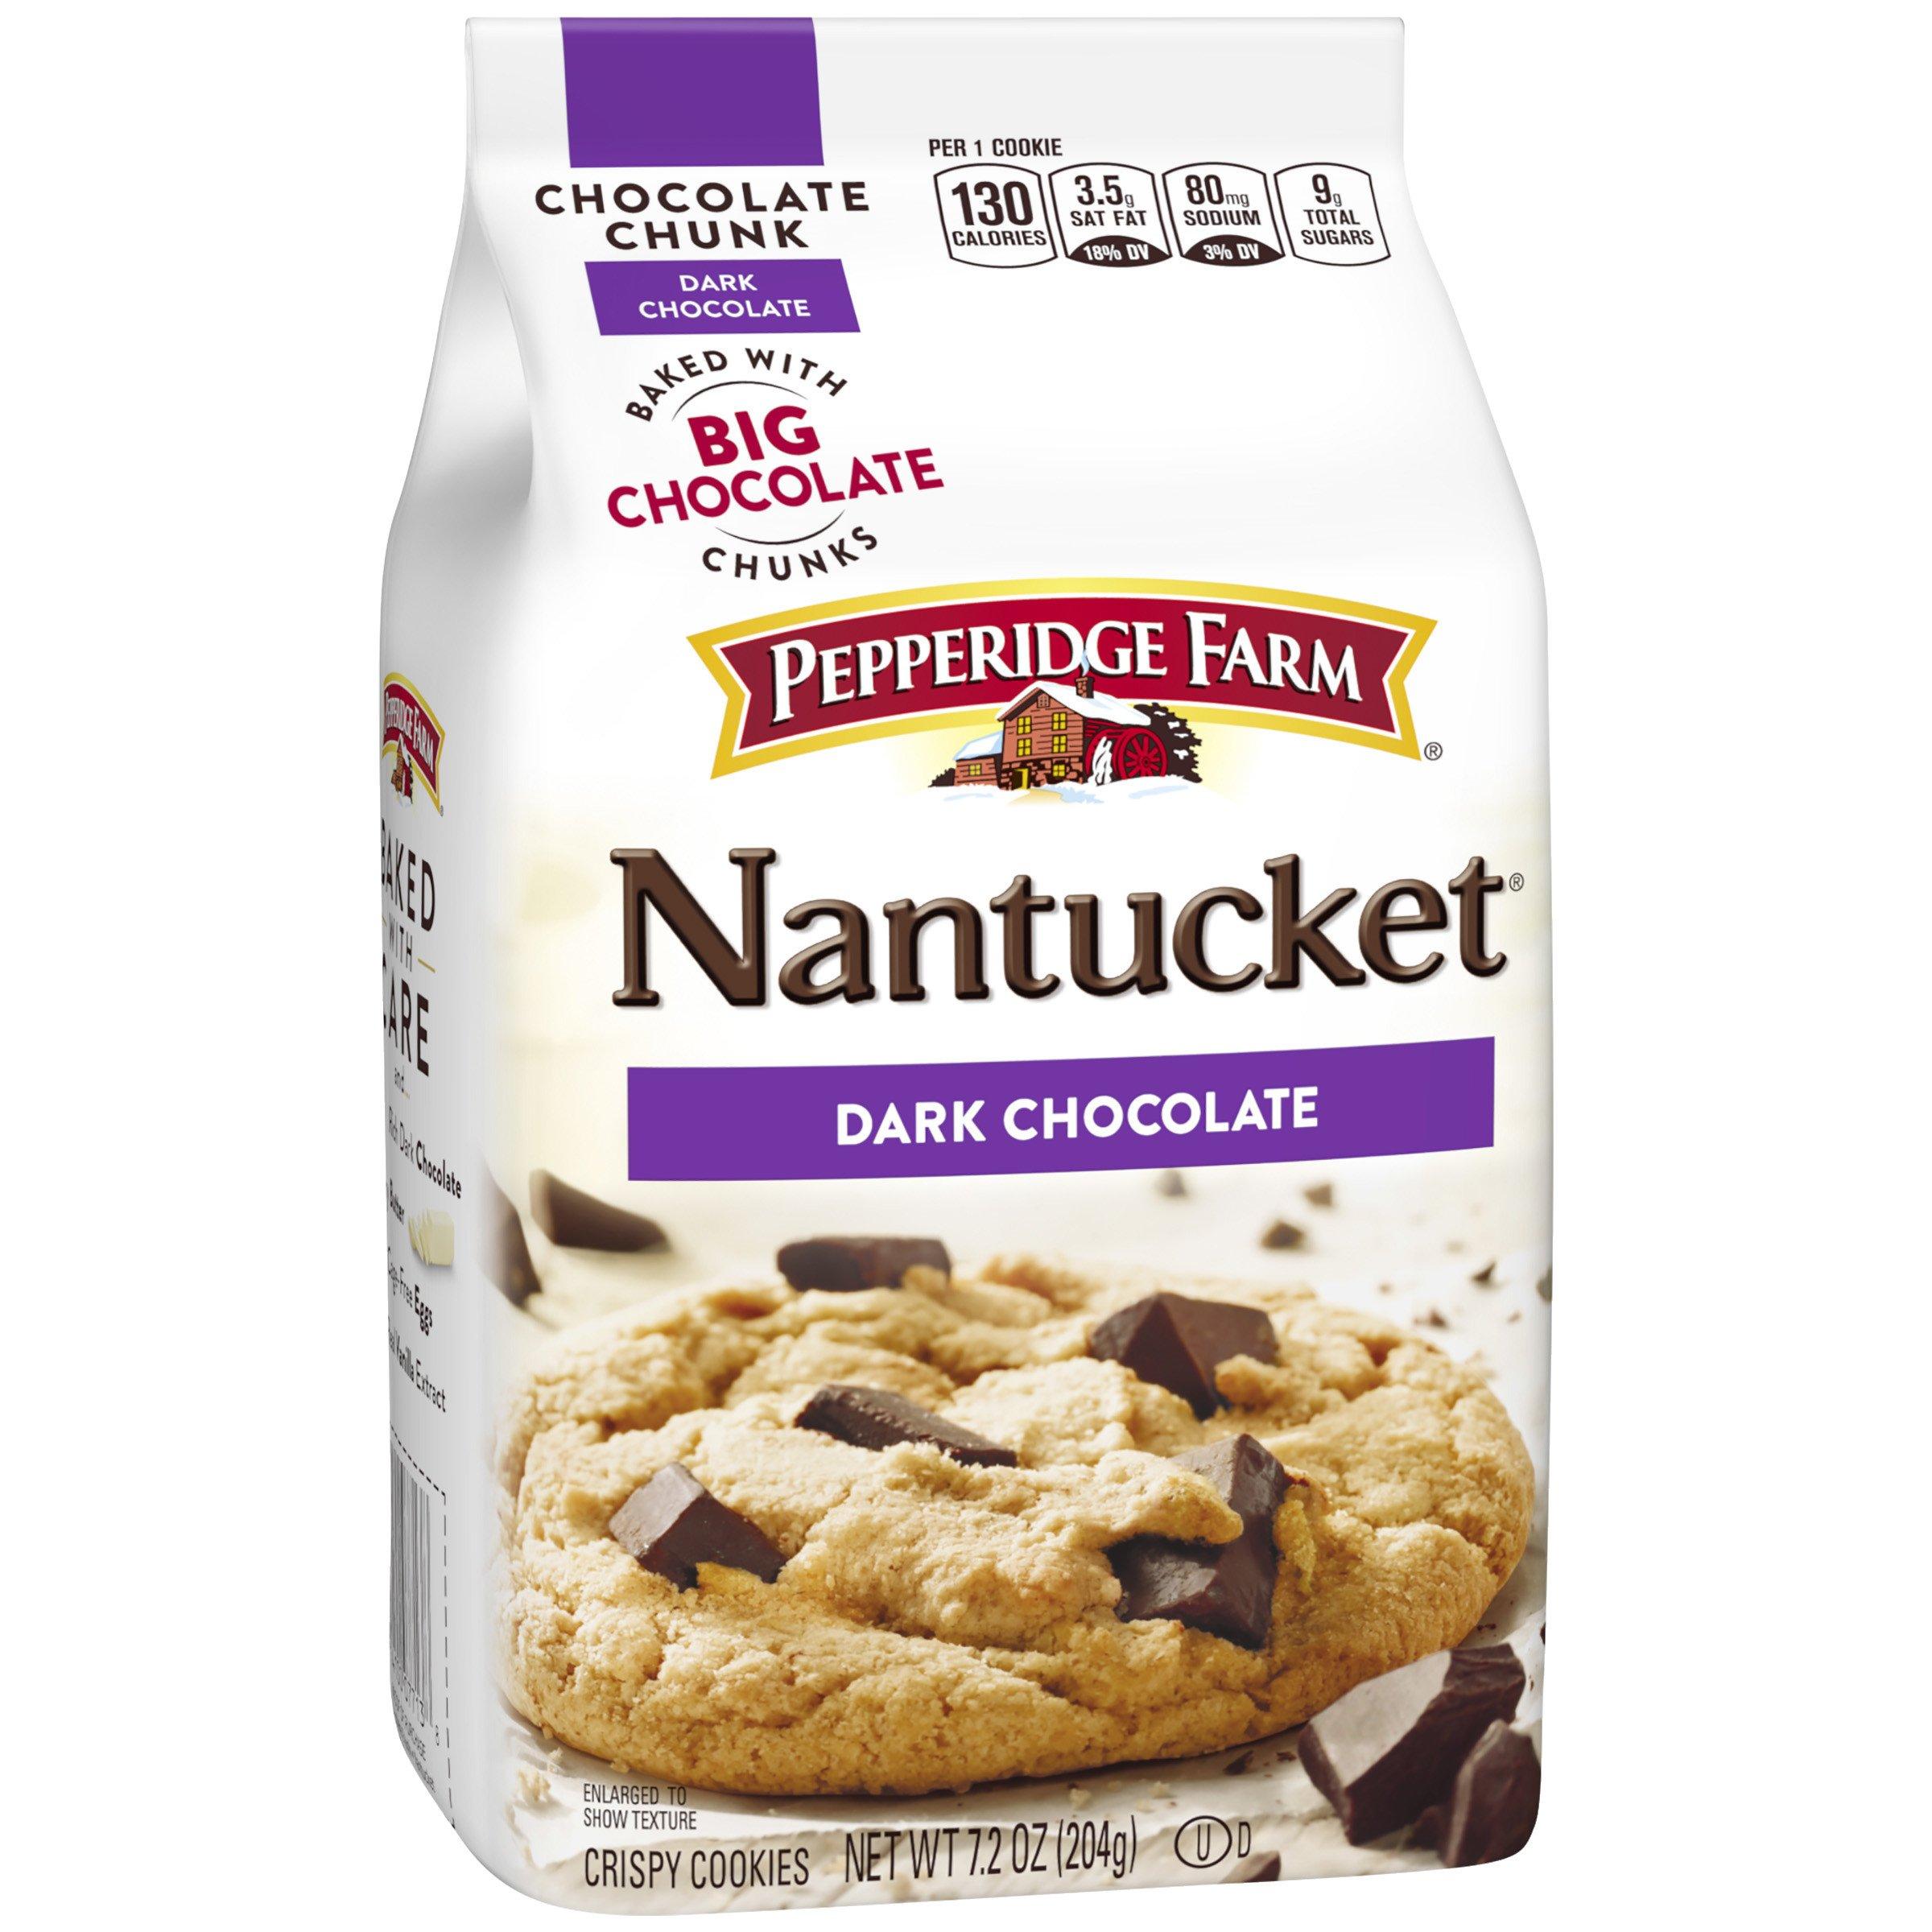 Pepperidge Farm, Nantucket, Crispy, Cookies, Dark Chocolate, 7.2oz, Bag, 20-count